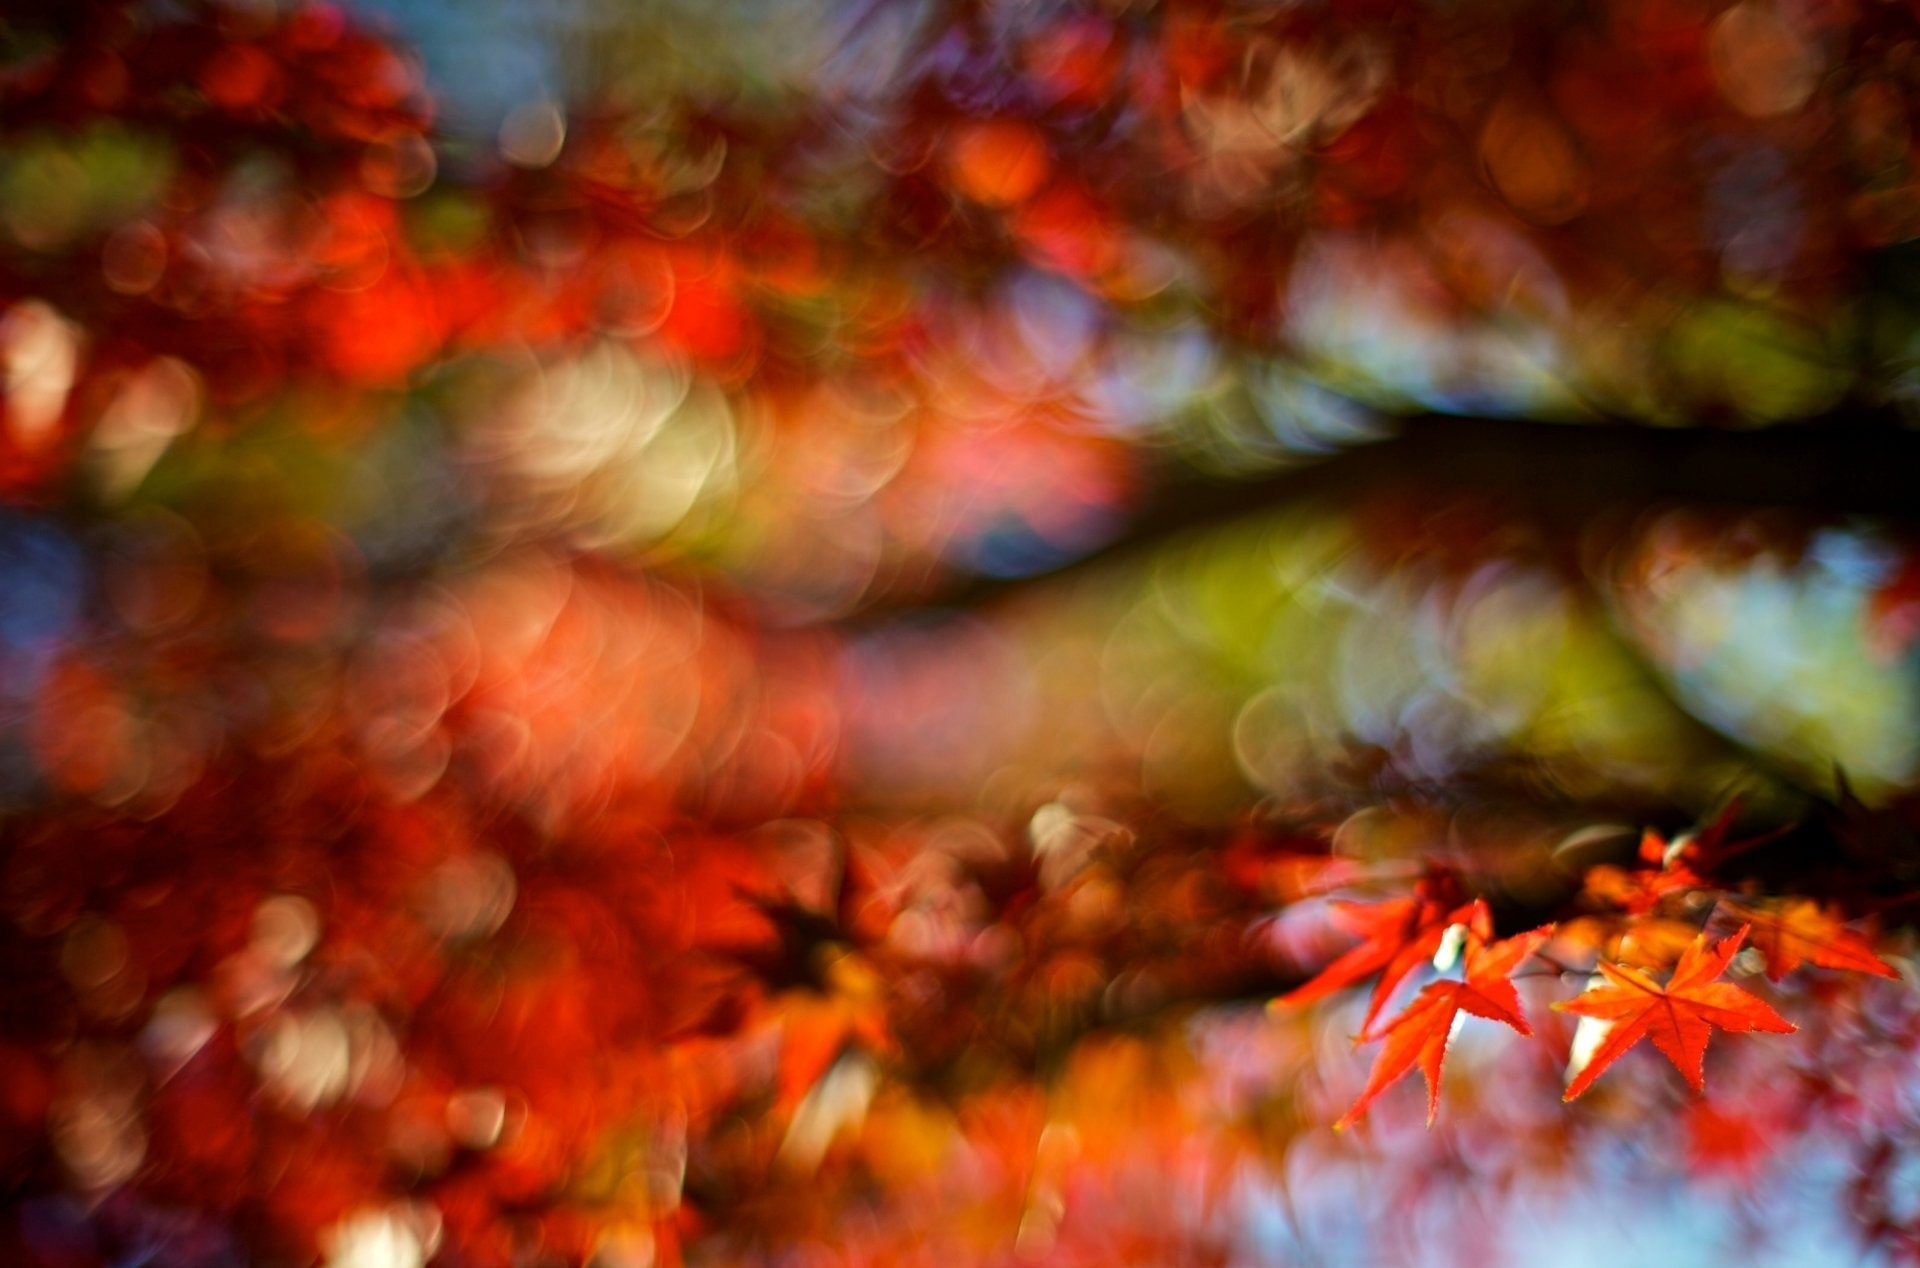 close up leaf leaf autumn red blur blur tree bokeh background wallpaper  widescreen full screen widescreen